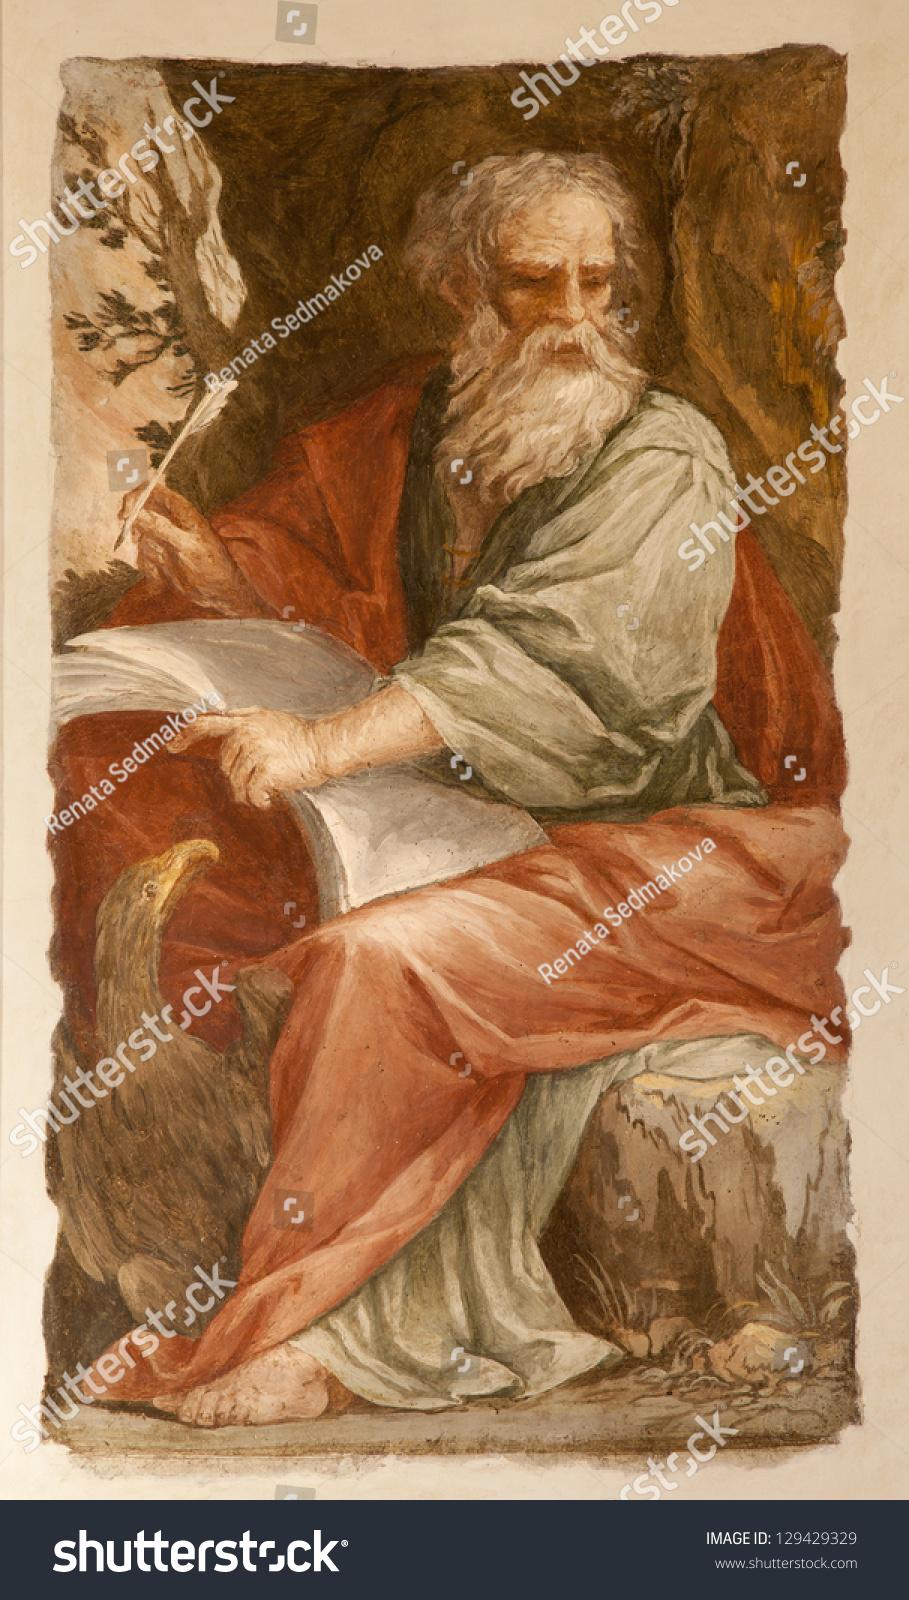 saint agnes of rome english literature essay Francisco de zubar n and his work english literature essay may 15, 2018 may 3, 2018 francisco de zurbaran, a spanish painter was born in fuentes de cantos, badajoz province in estremadura and baptized on nov 7, 1598.